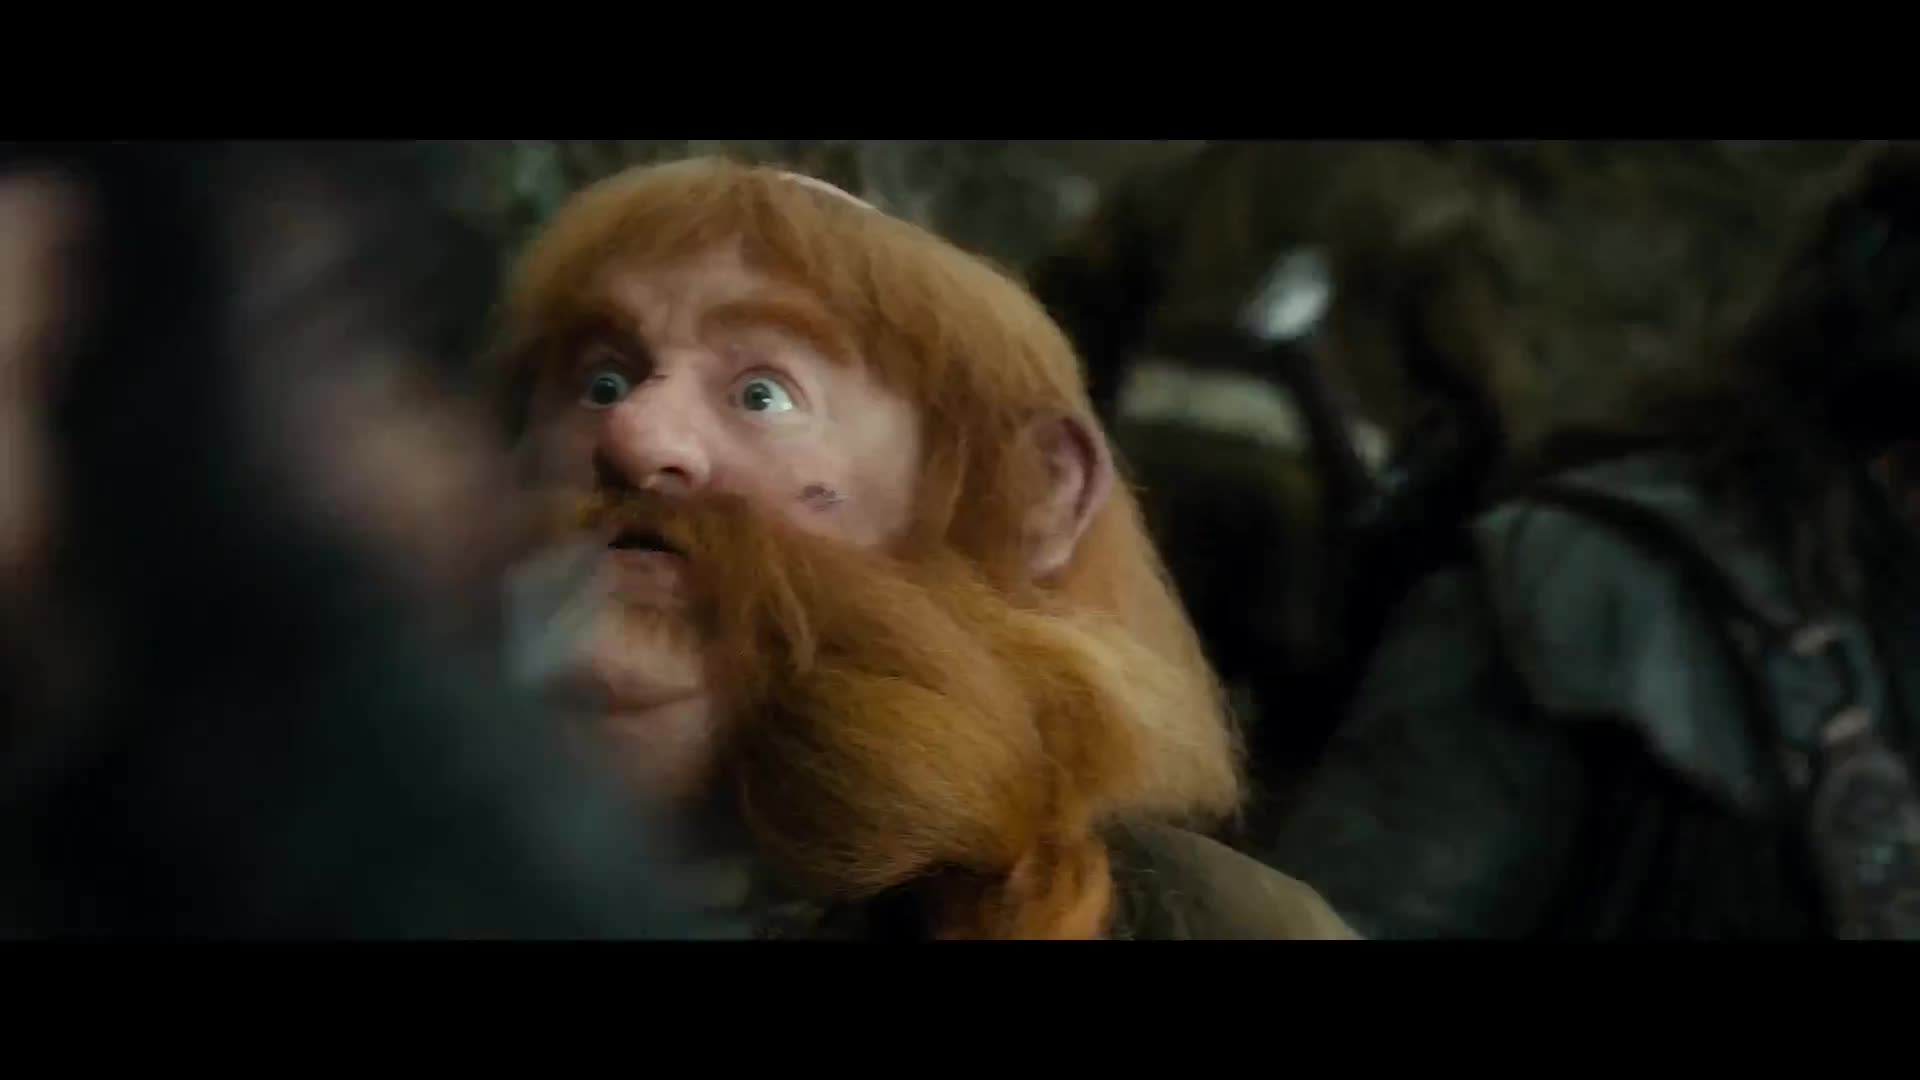 The Hobbit 2 เดอะ ฮอบบิท 2 ดินแดนเปลี่ยวร้างของสม็อค (2013)